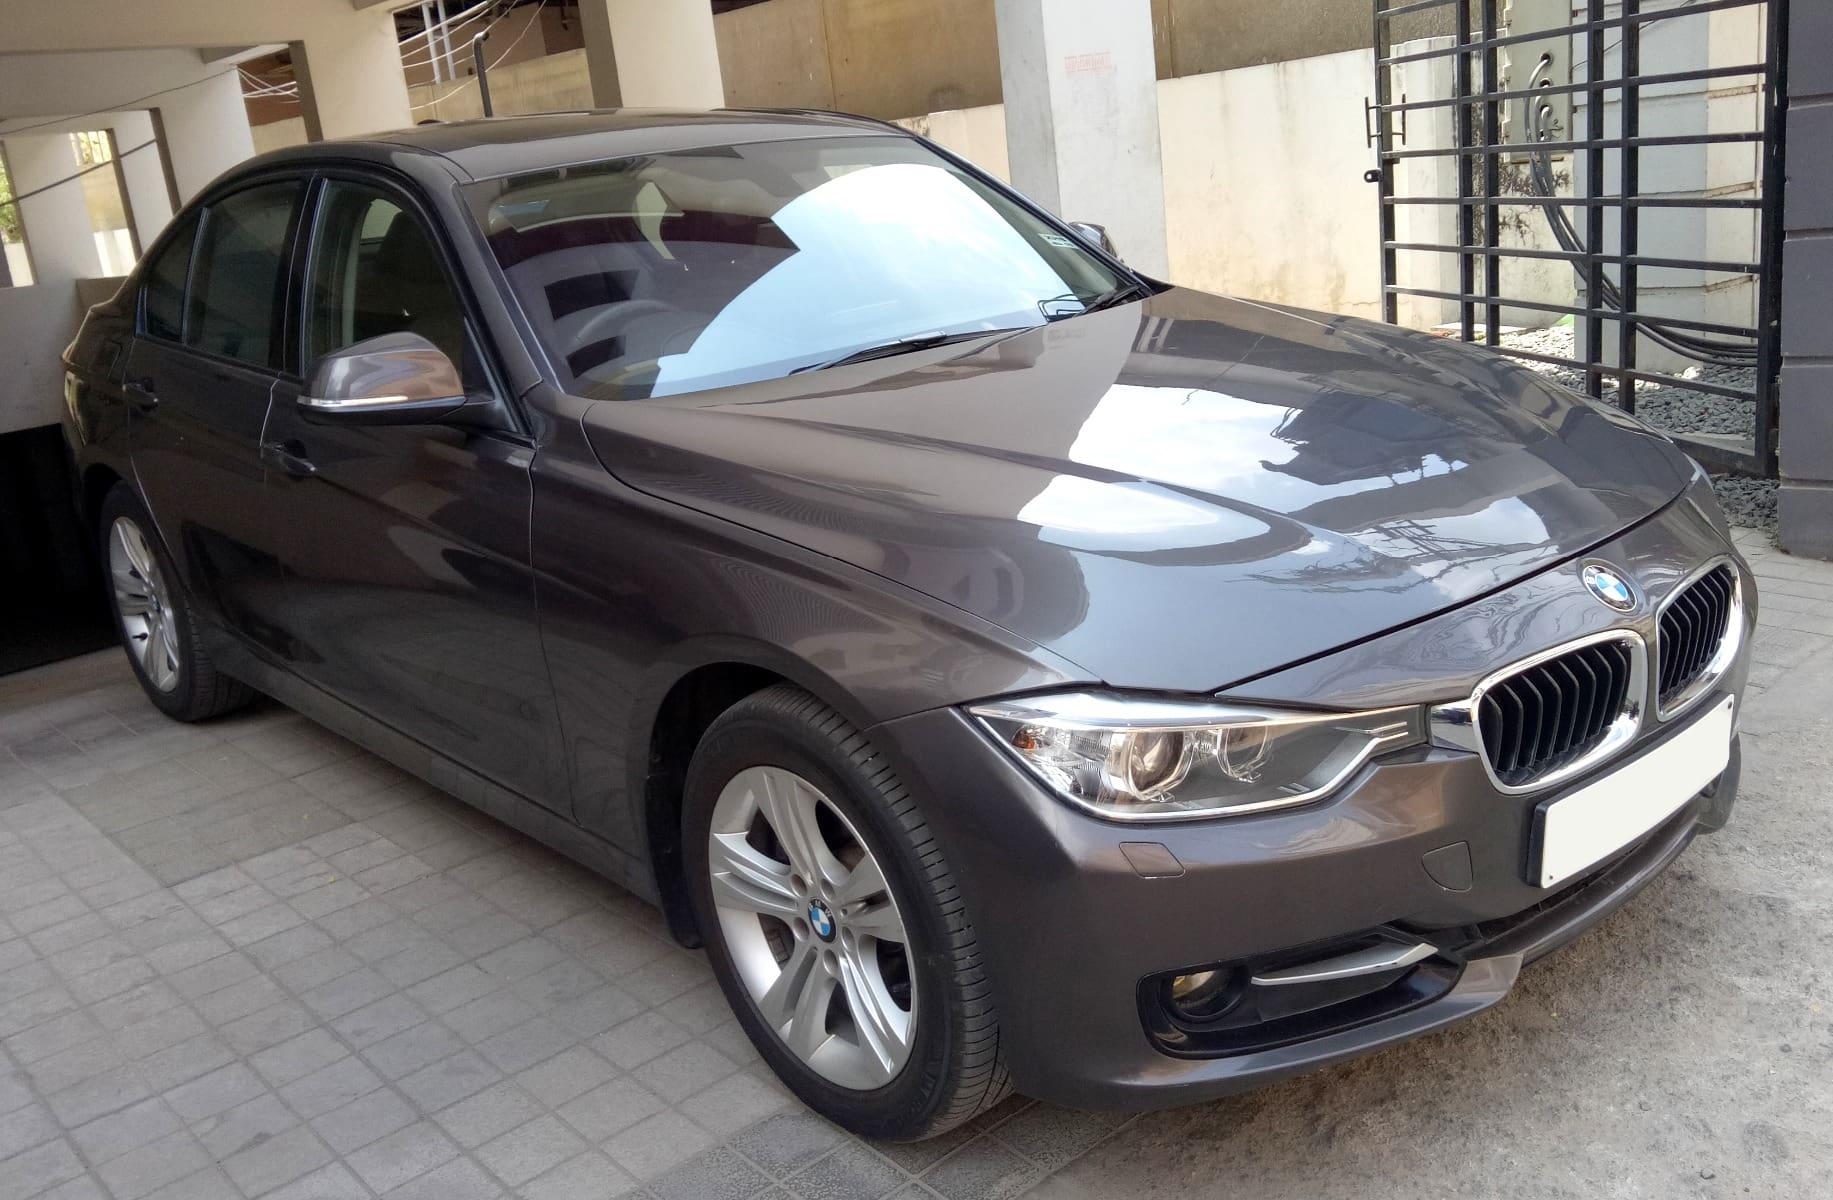 BMW 3 Series 2011-2015 320d Luxury Line